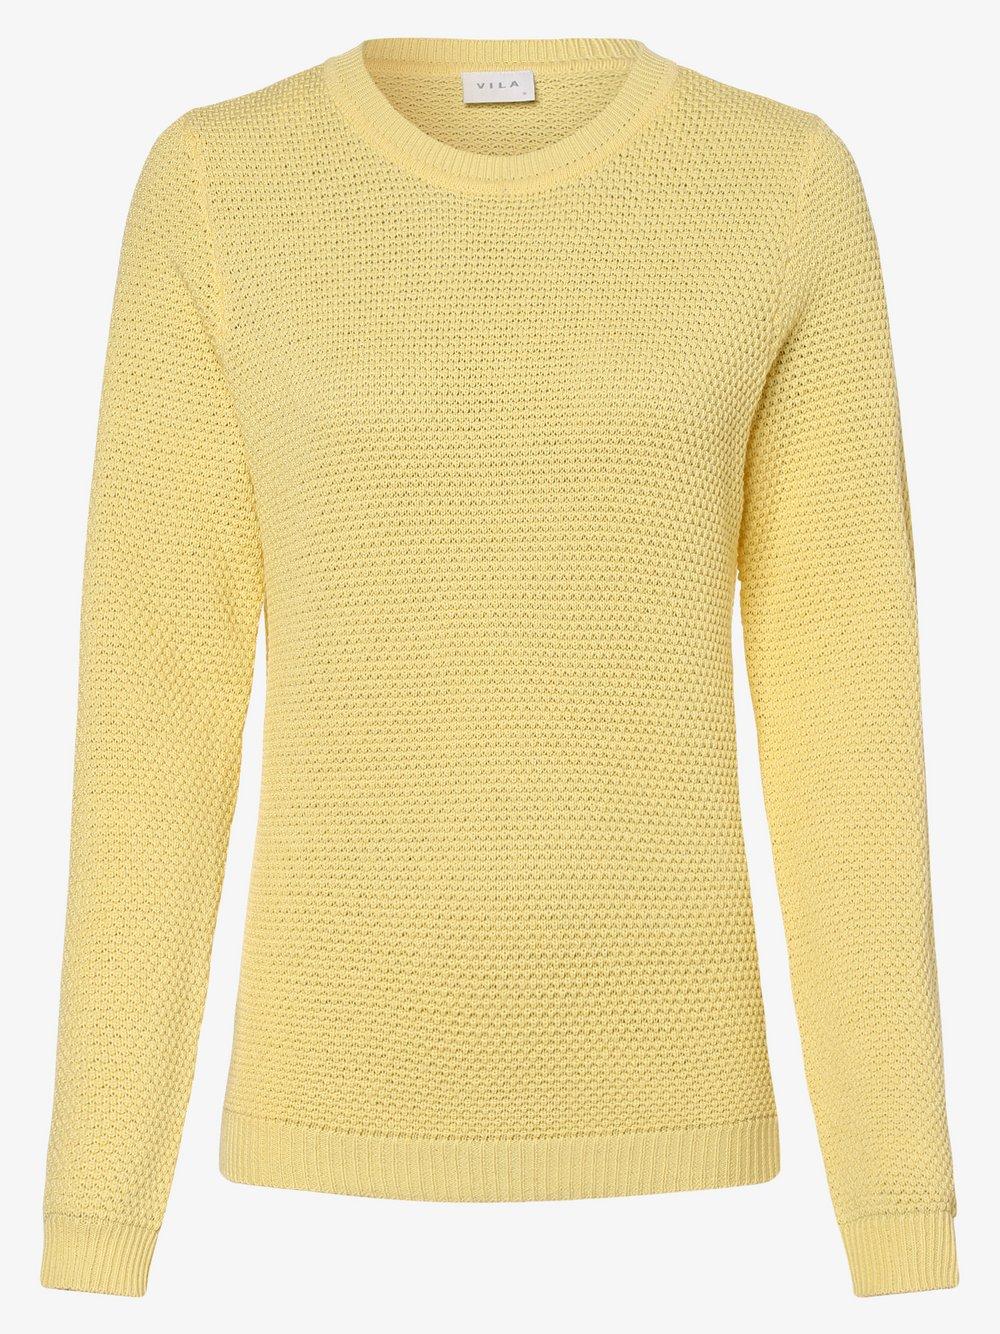 Vila - Sweter damski – VIChassa, żółty